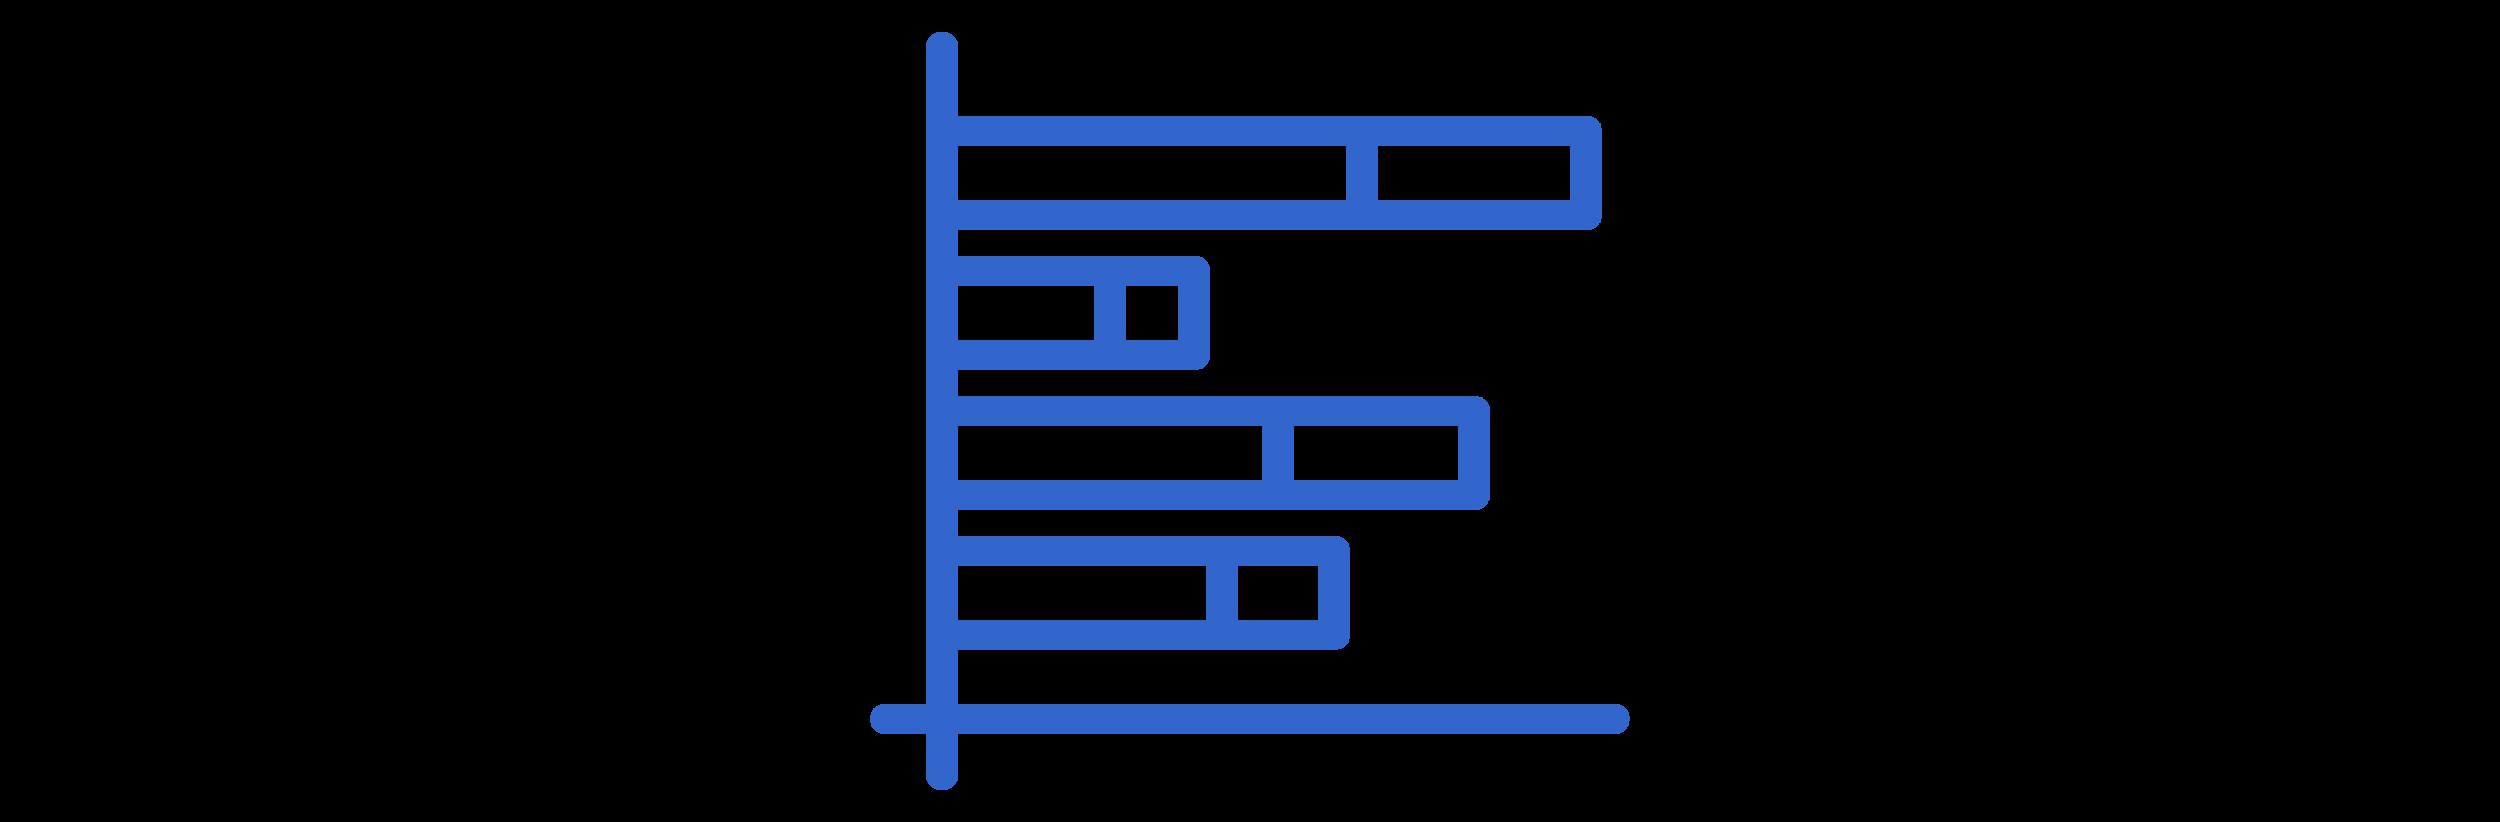 icon-Statistics-center.png